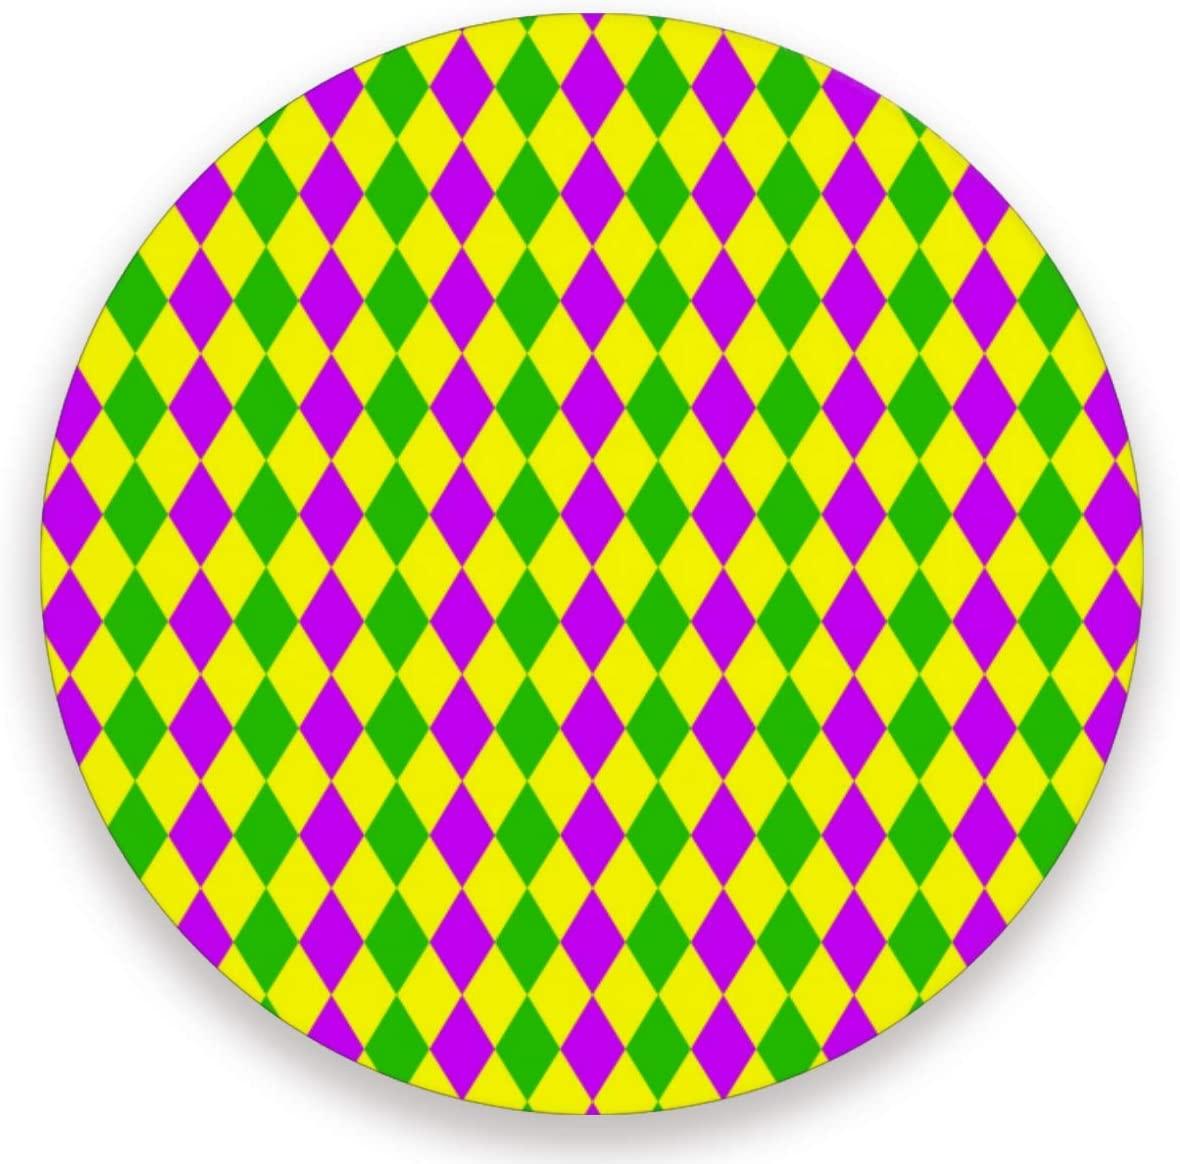 Olinyou Mardi Gras Zigzag Purple Green Yellow Rhombus Coasters for Drinks Set of 4 Absorbent Ceramic Stone Round Coaster with Cork Base